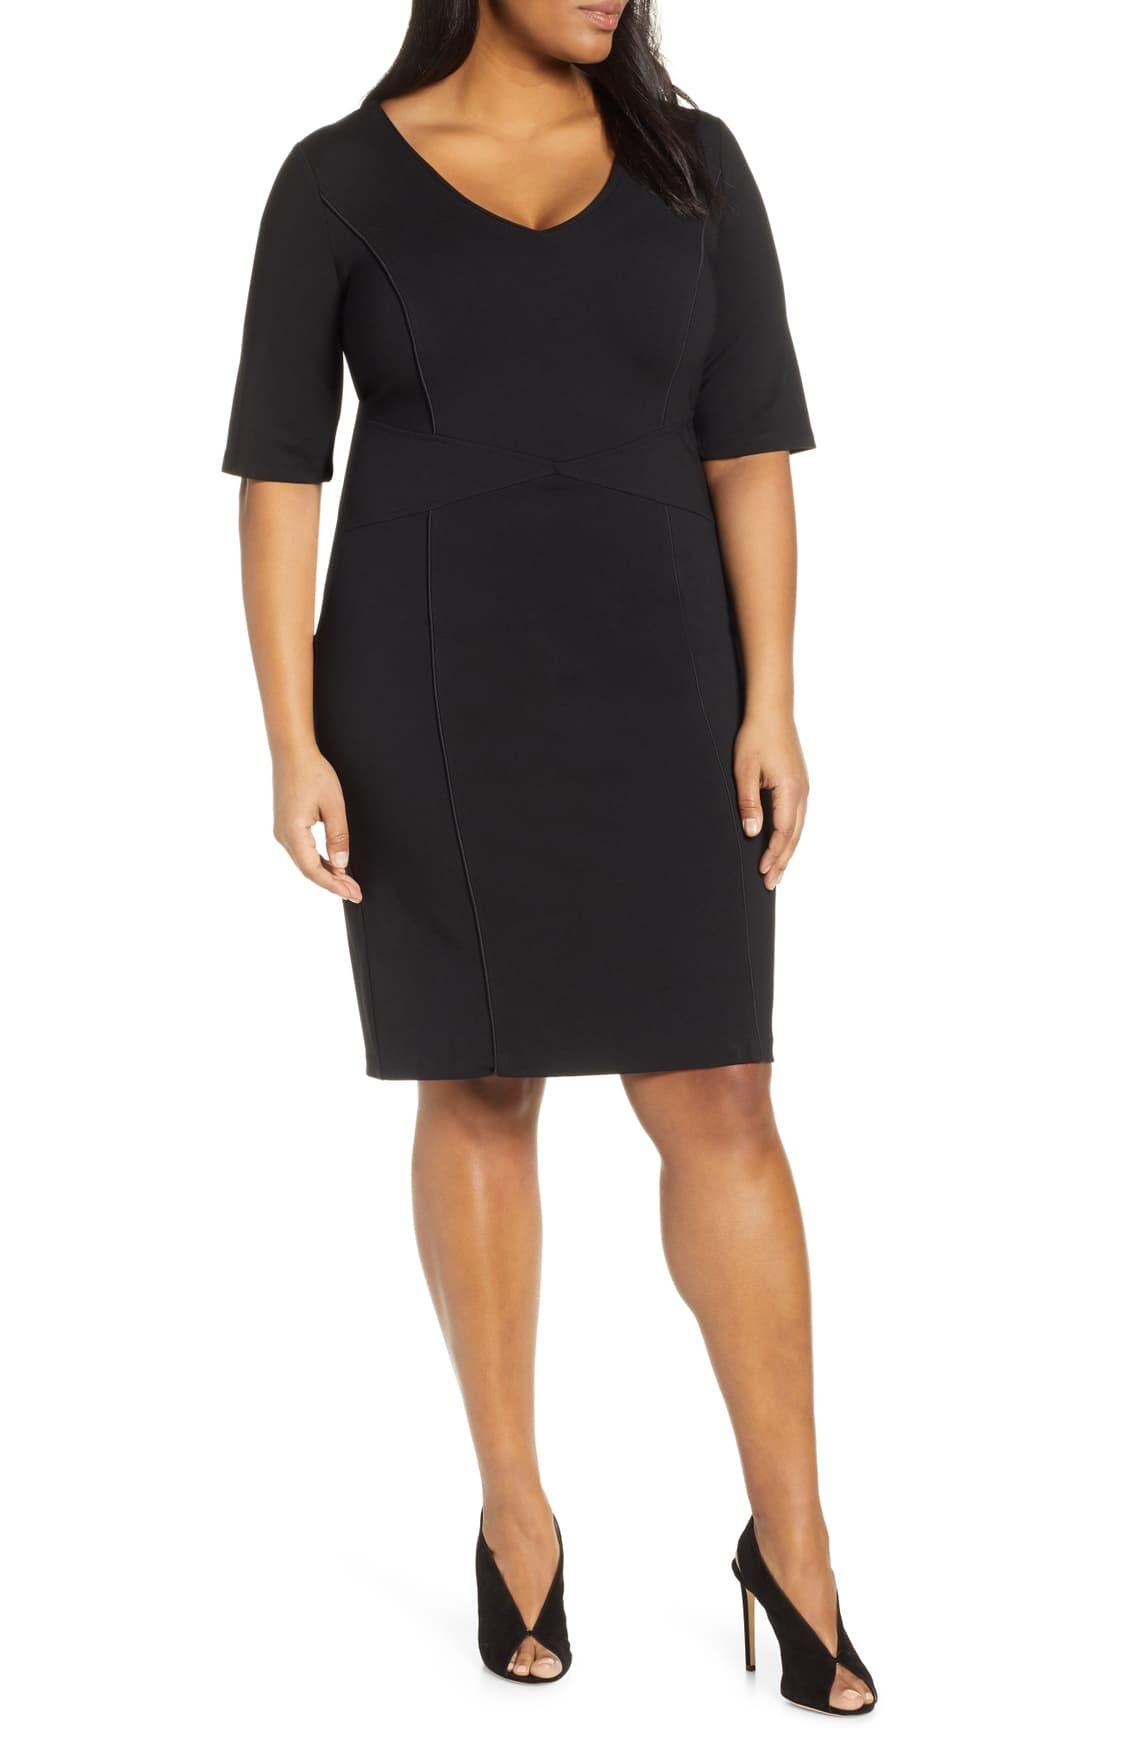 21++ Plus size sheath dress ideas